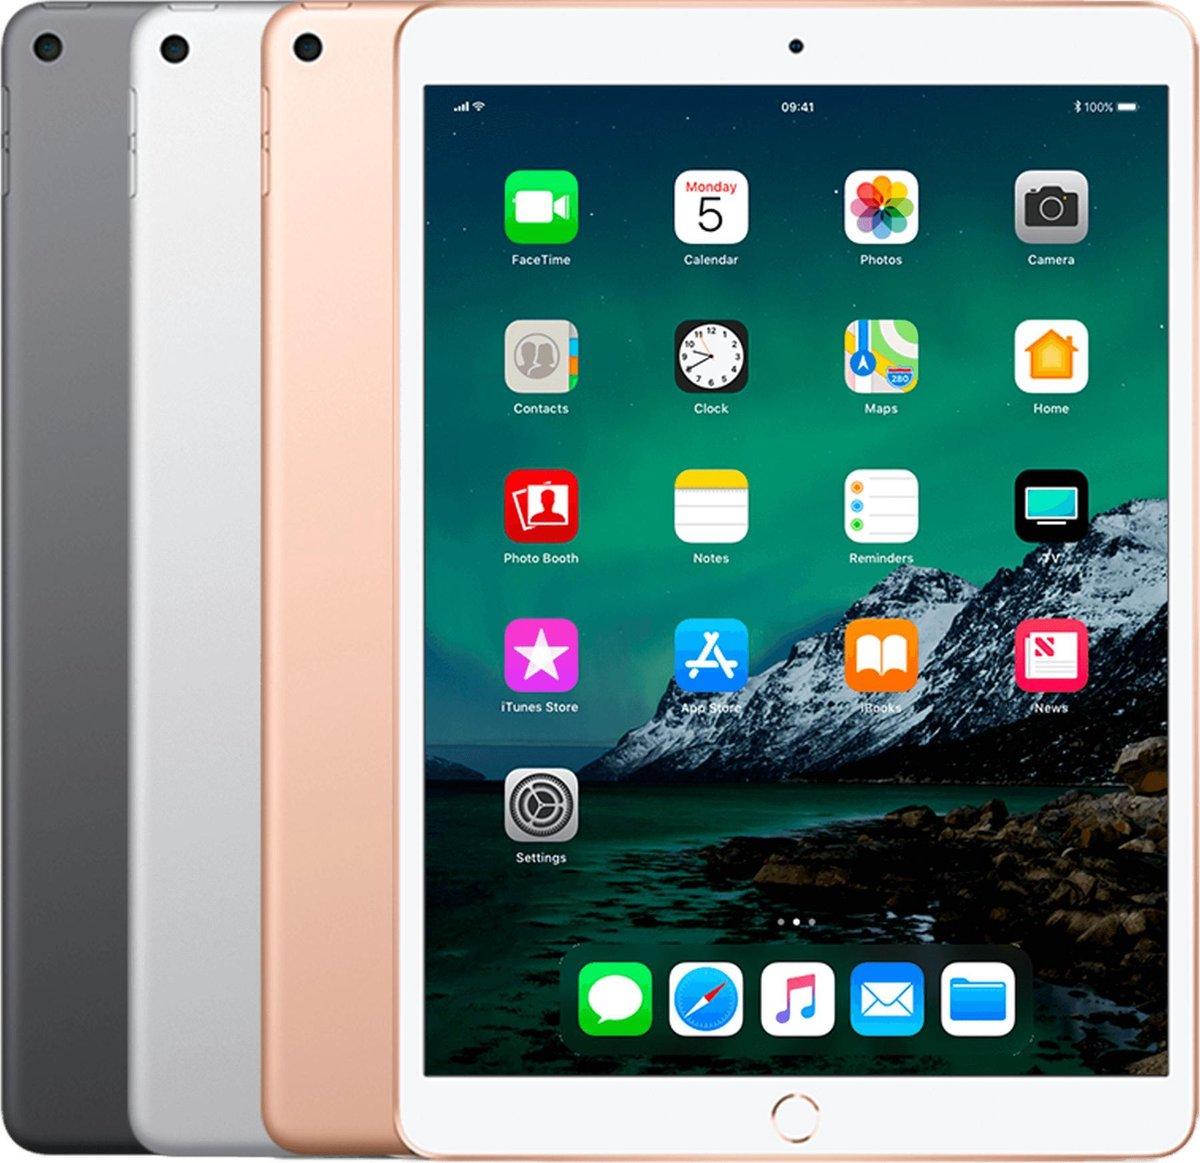 Apple iPad Air 3 - 64GB - Wi-Fi - Space Gray - B-grade